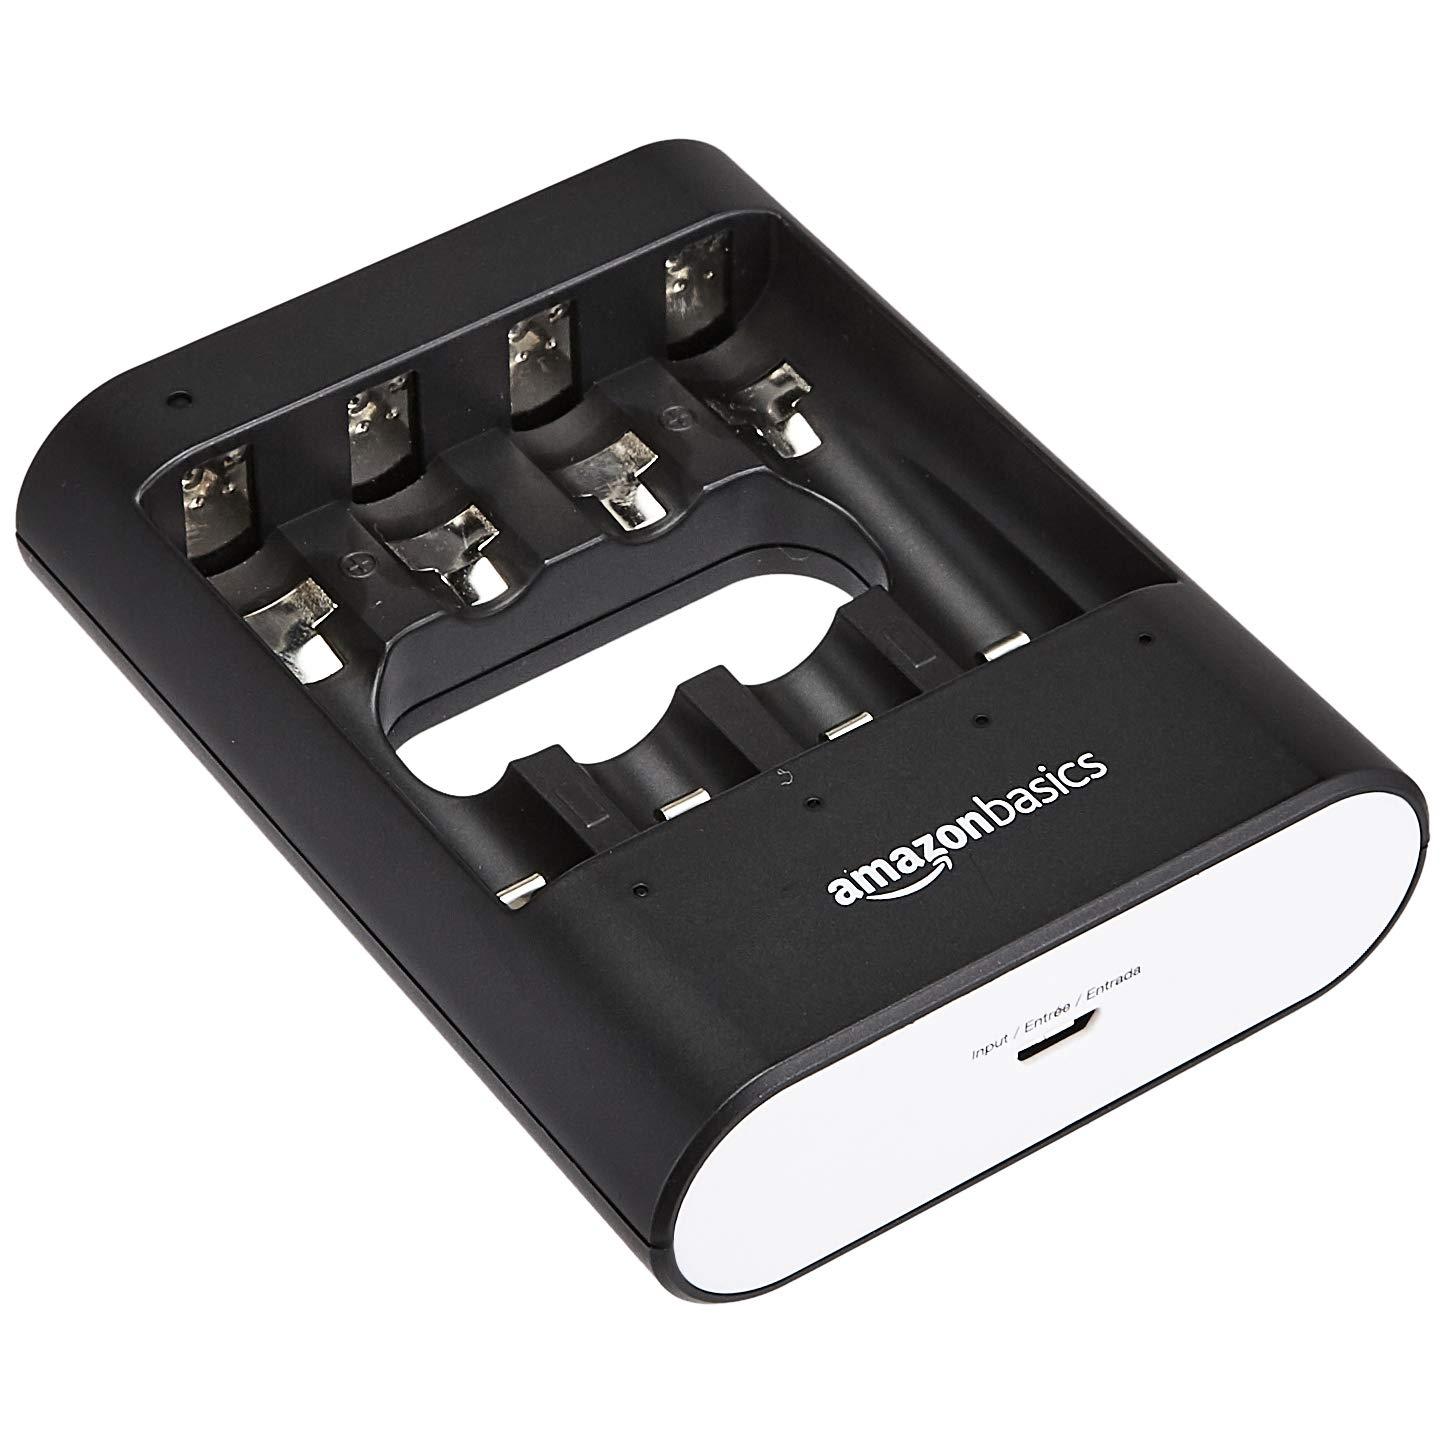 "Caricabatterie USB Basics nero /""Overnight/"""